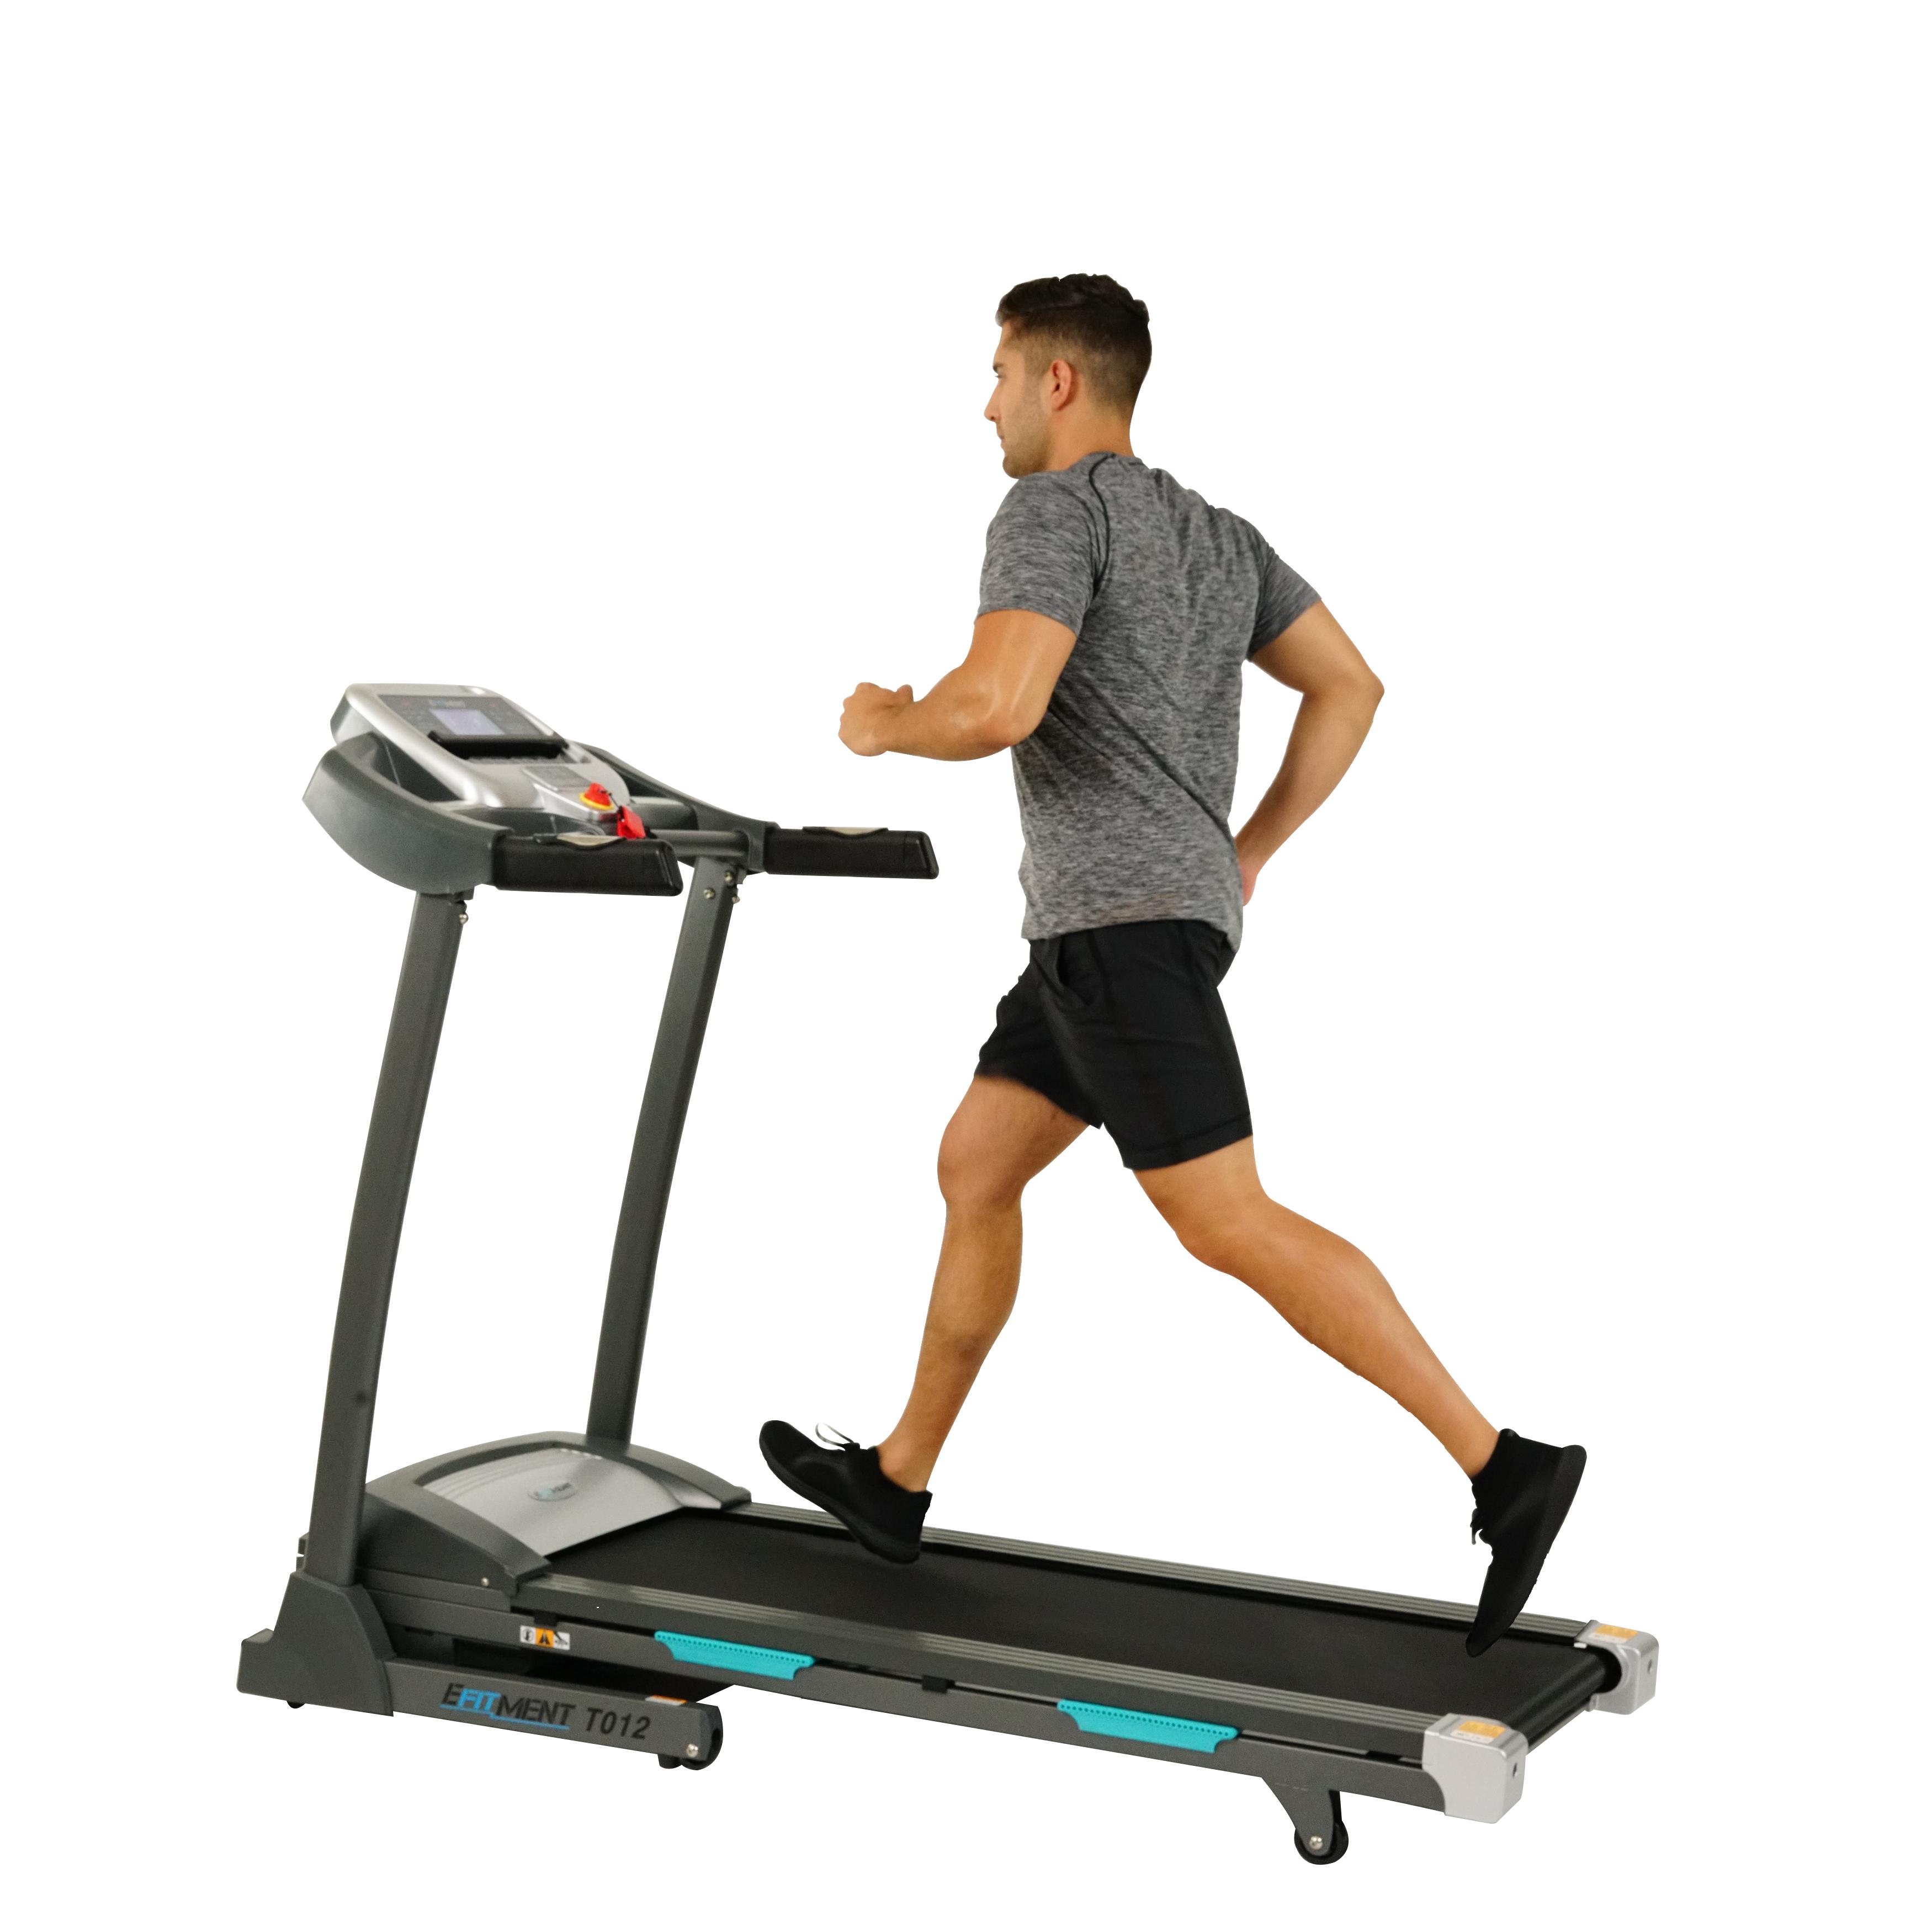 Auto Incline Folding Treadmill w/ Bluetooth by EFITMENT - T012